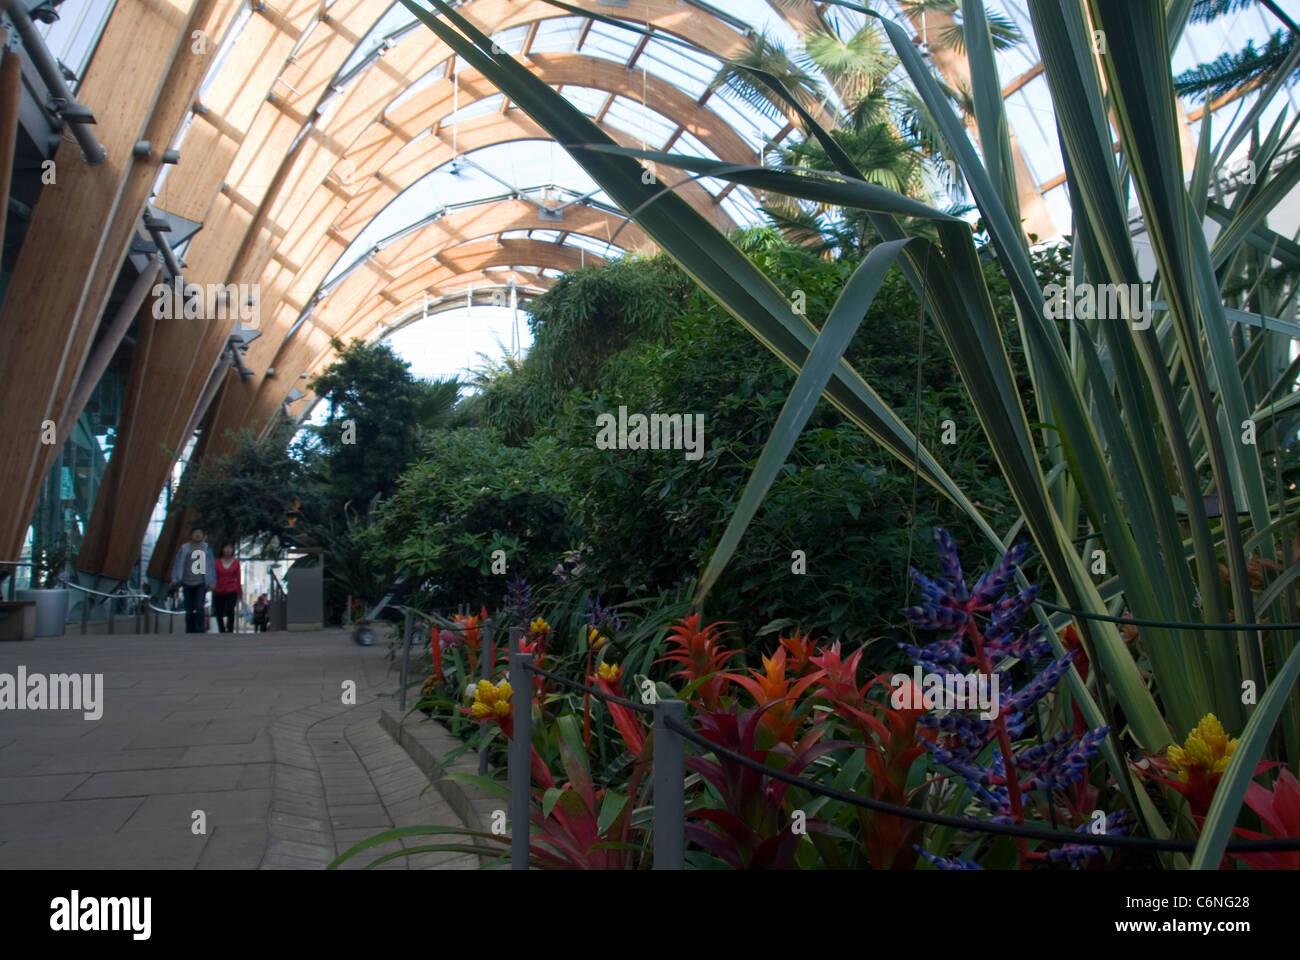 plants growing in winter gardens sheffield uk daytime interior